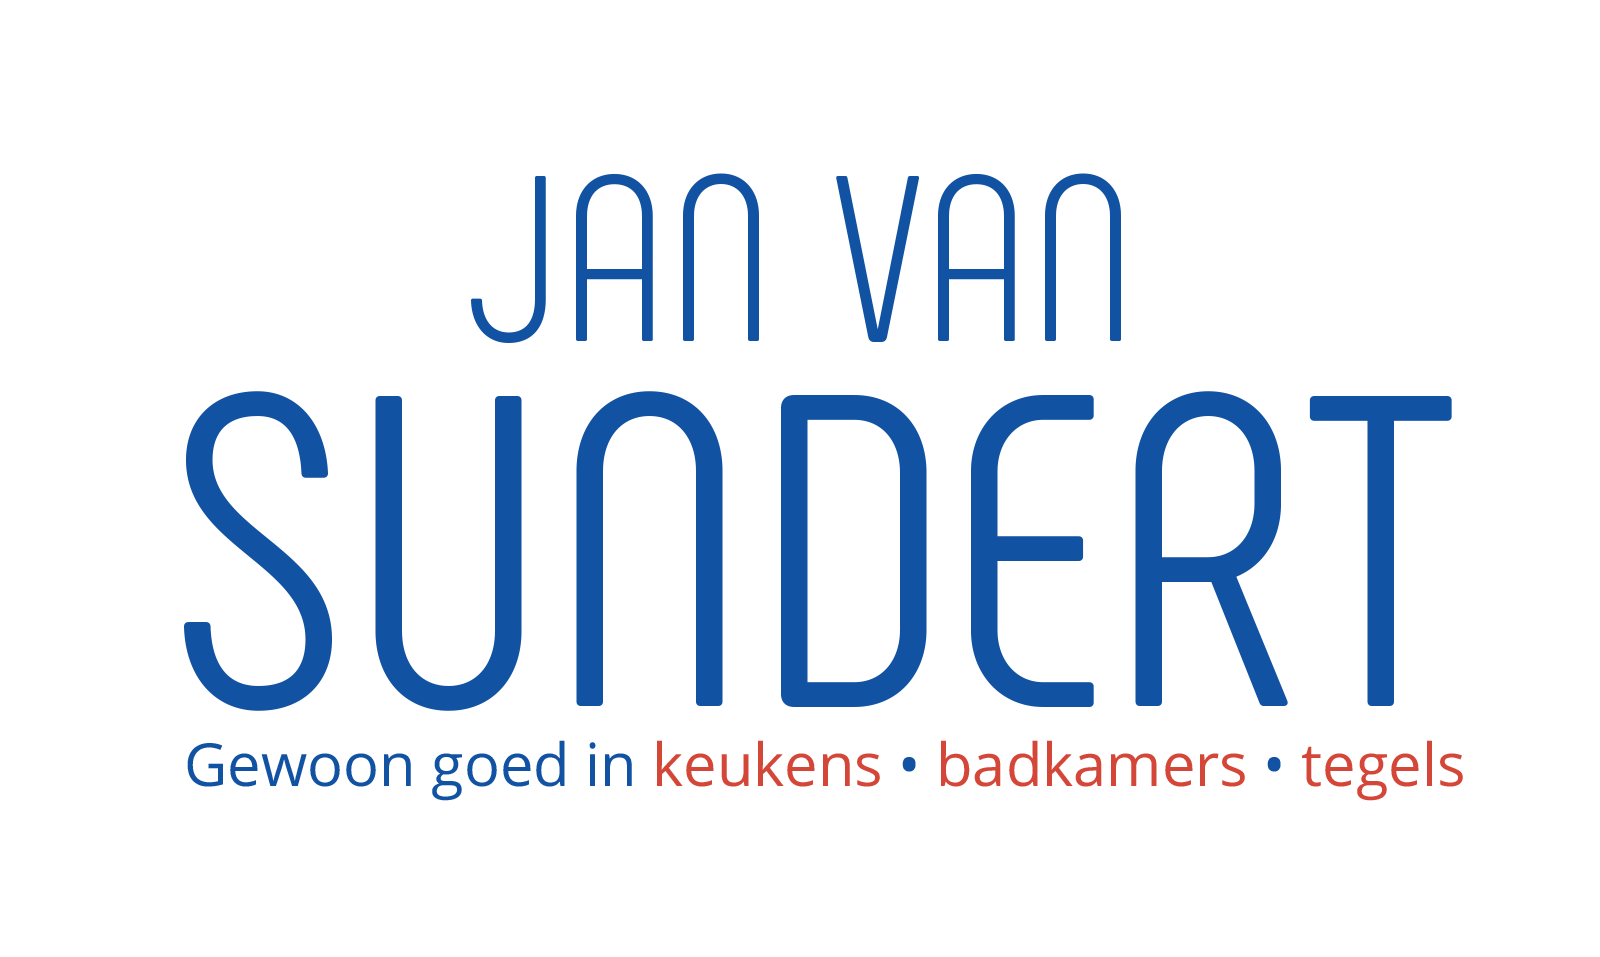 jan van sundert reviews   read customer service reviews of www